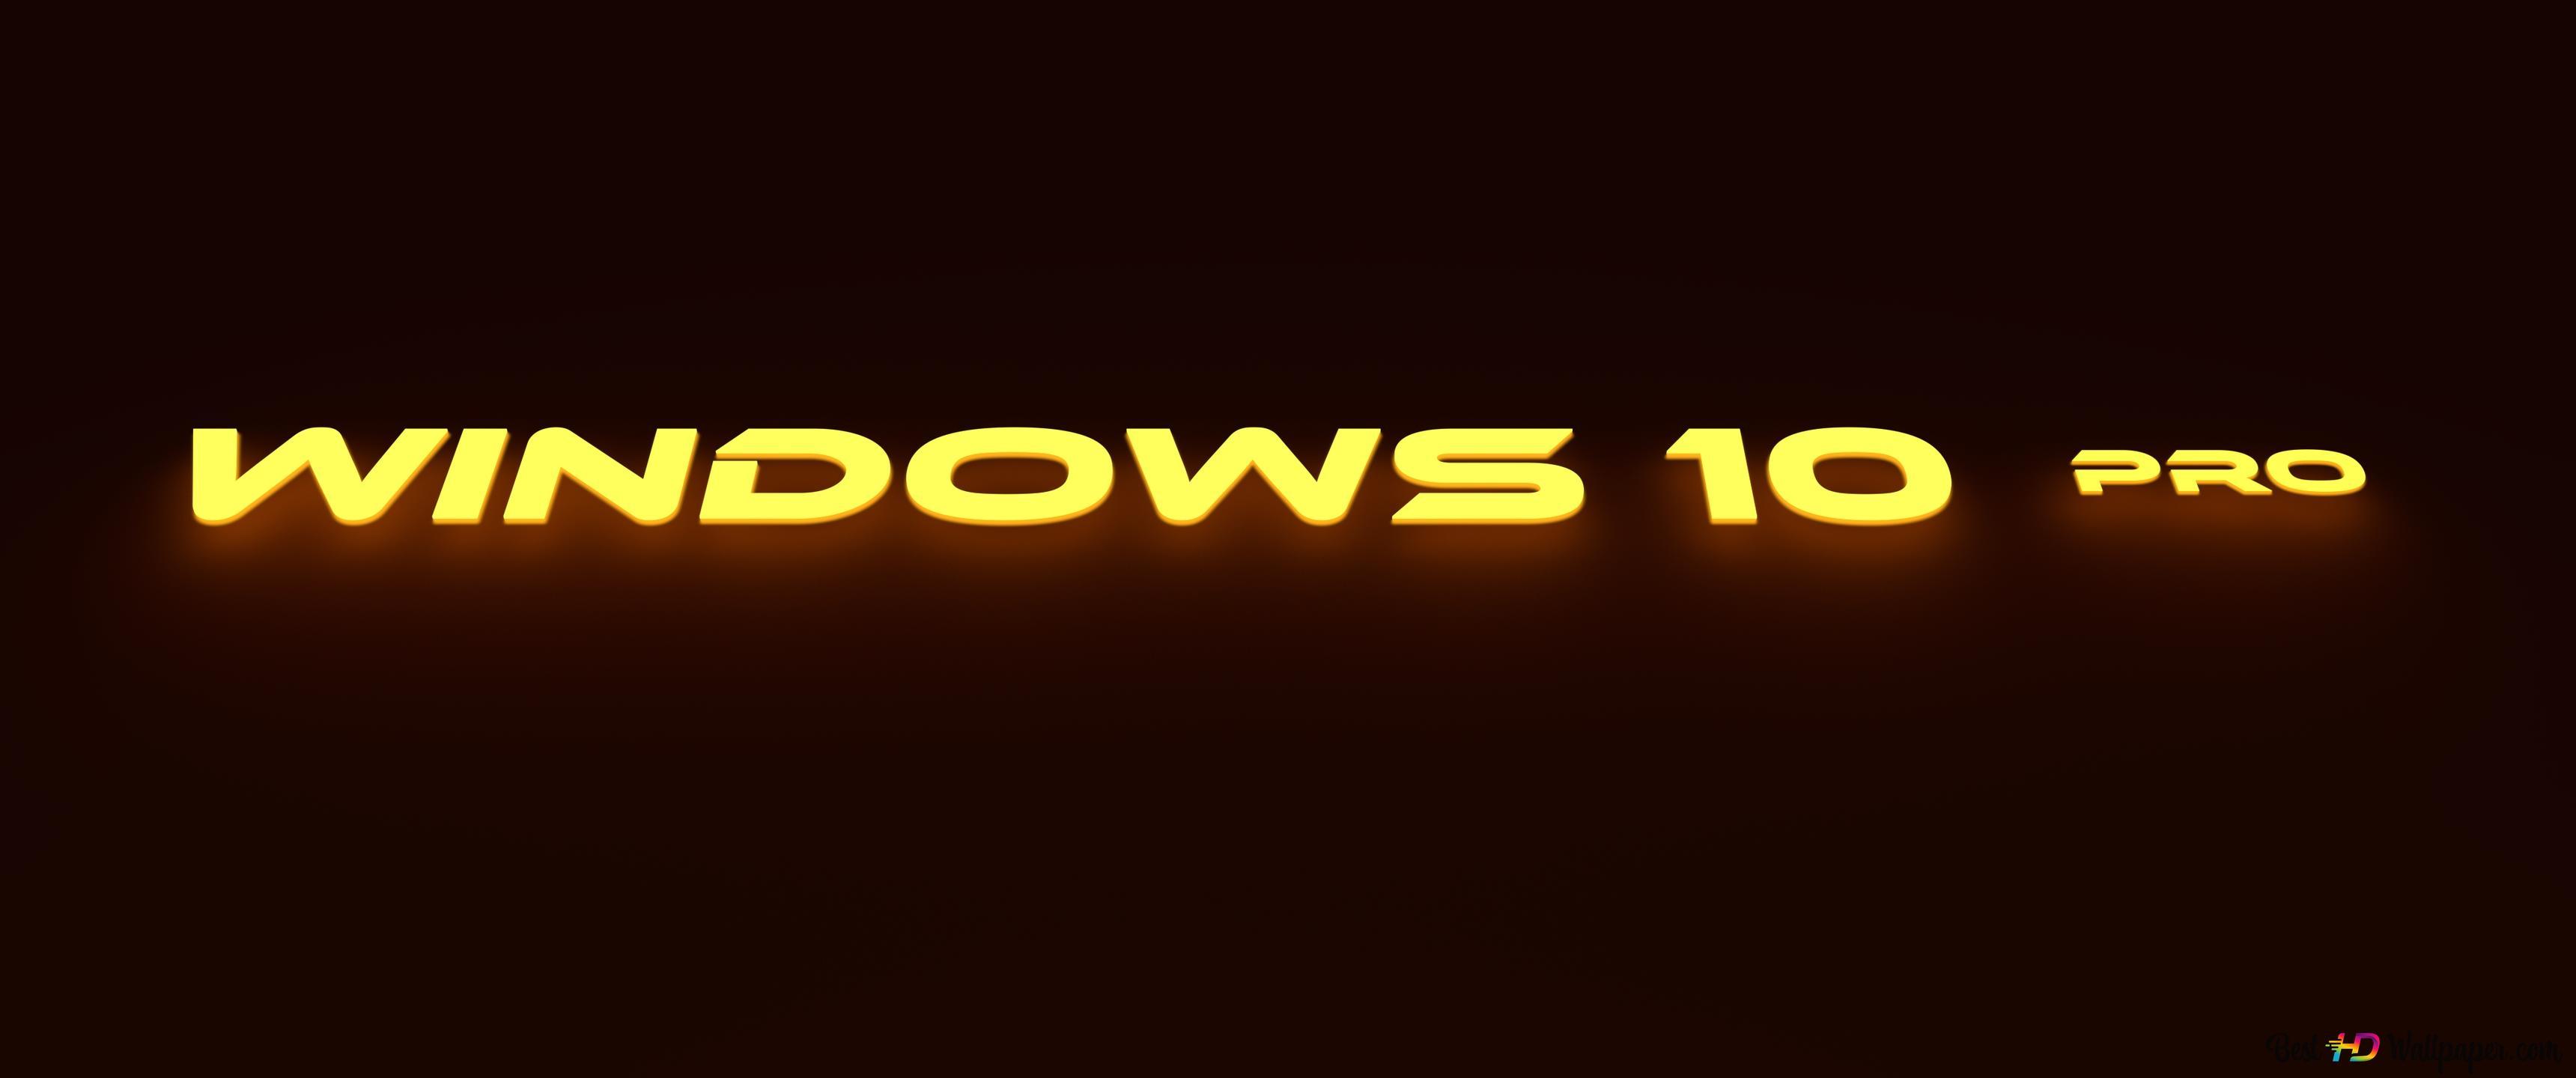 Windows 10 Pro Unduhan Wallpaper Hd